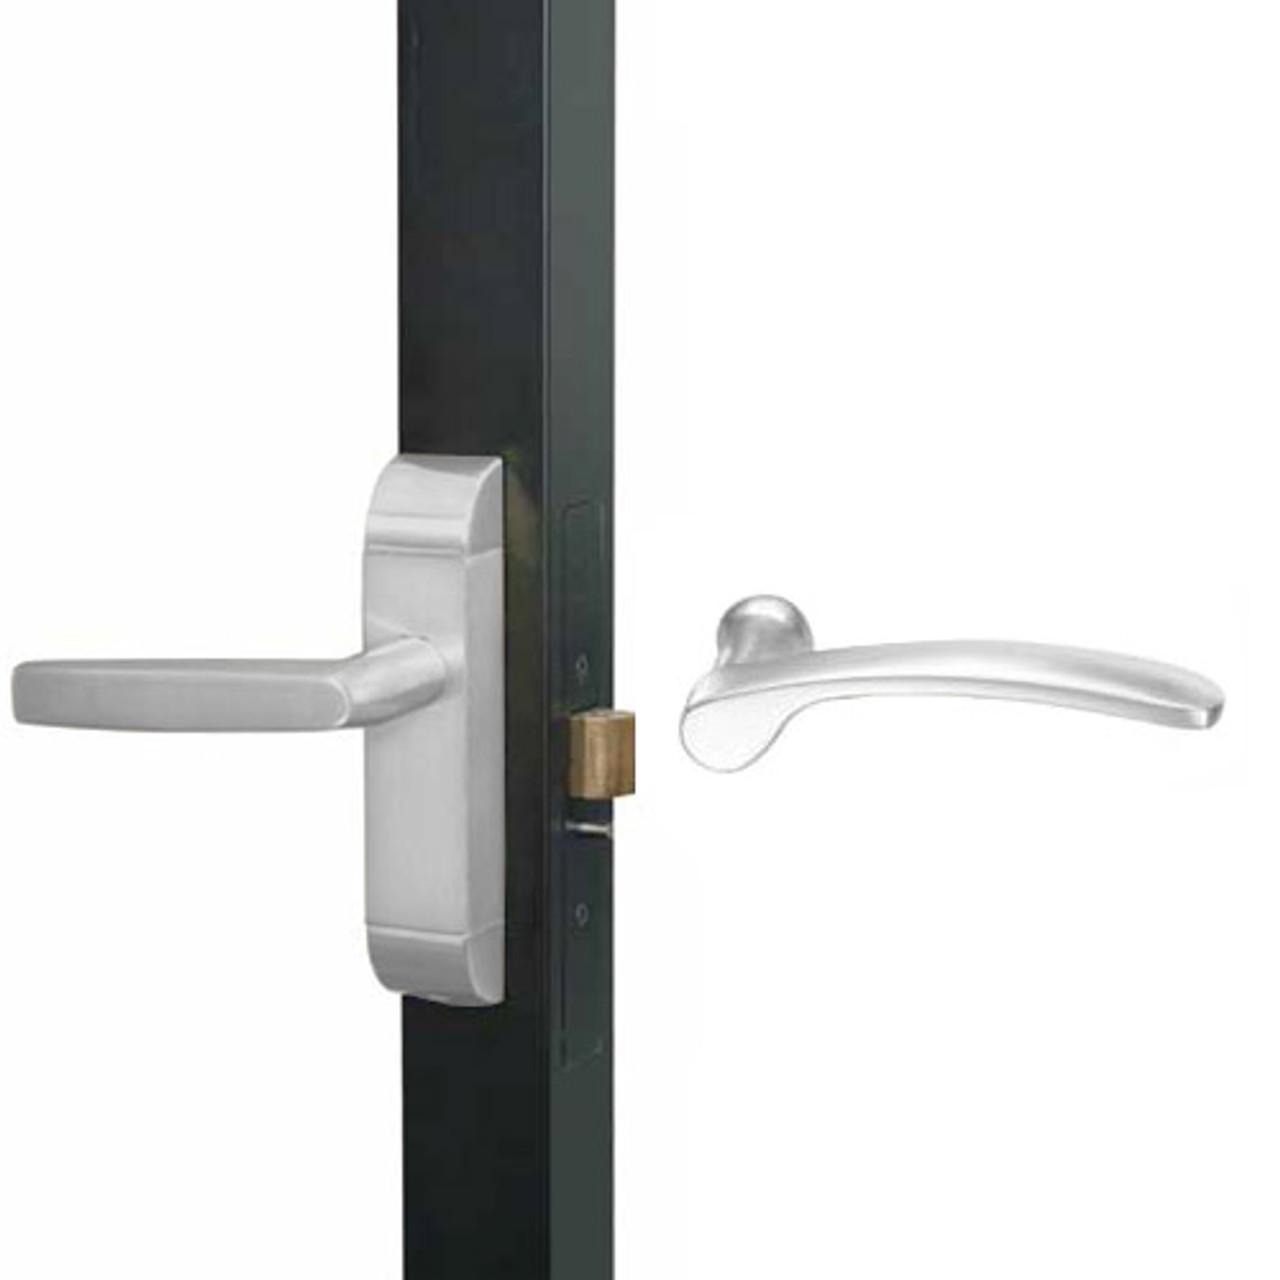 4600M-MN-552-US32 Adams Rite MN Designer Deadlatch handle in Bright Stainless Finish